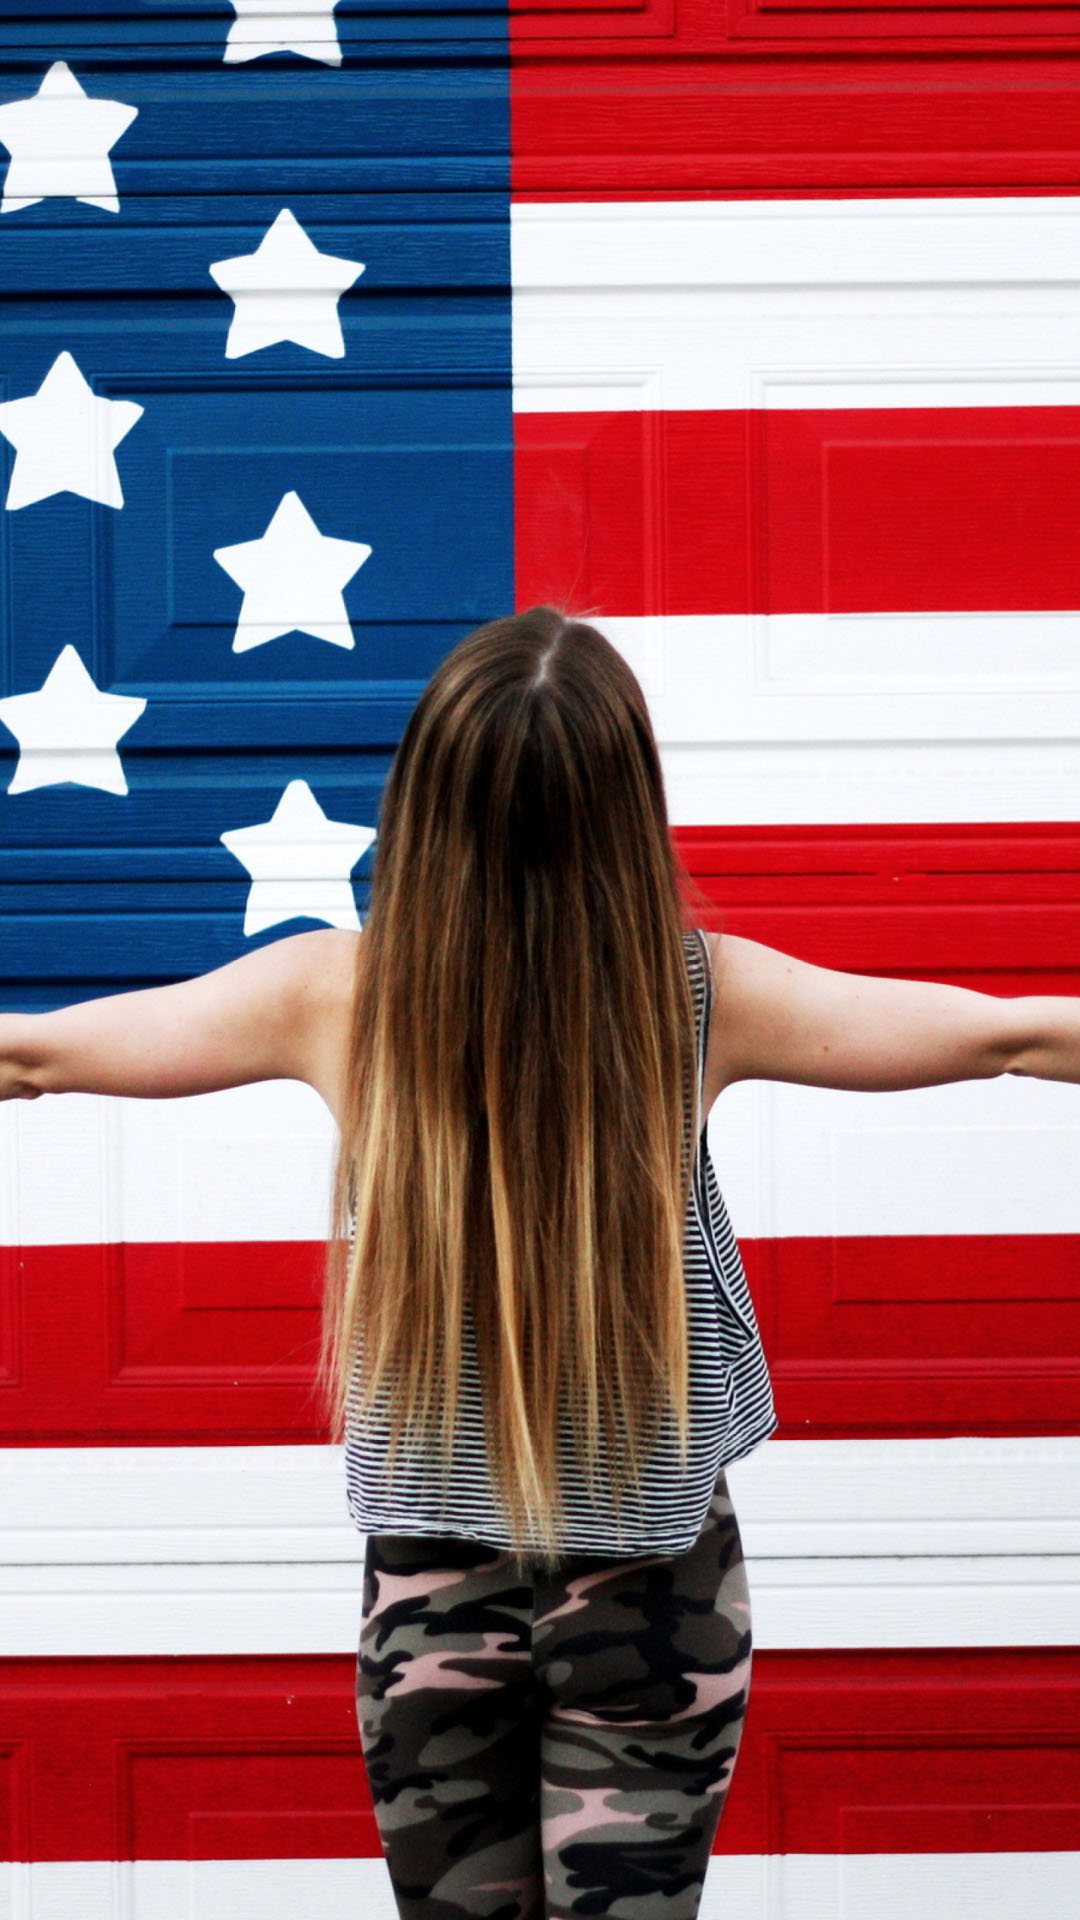 Iran Beautiful Girl Wallpaper Free Download American Flag Iphone Backgrounds